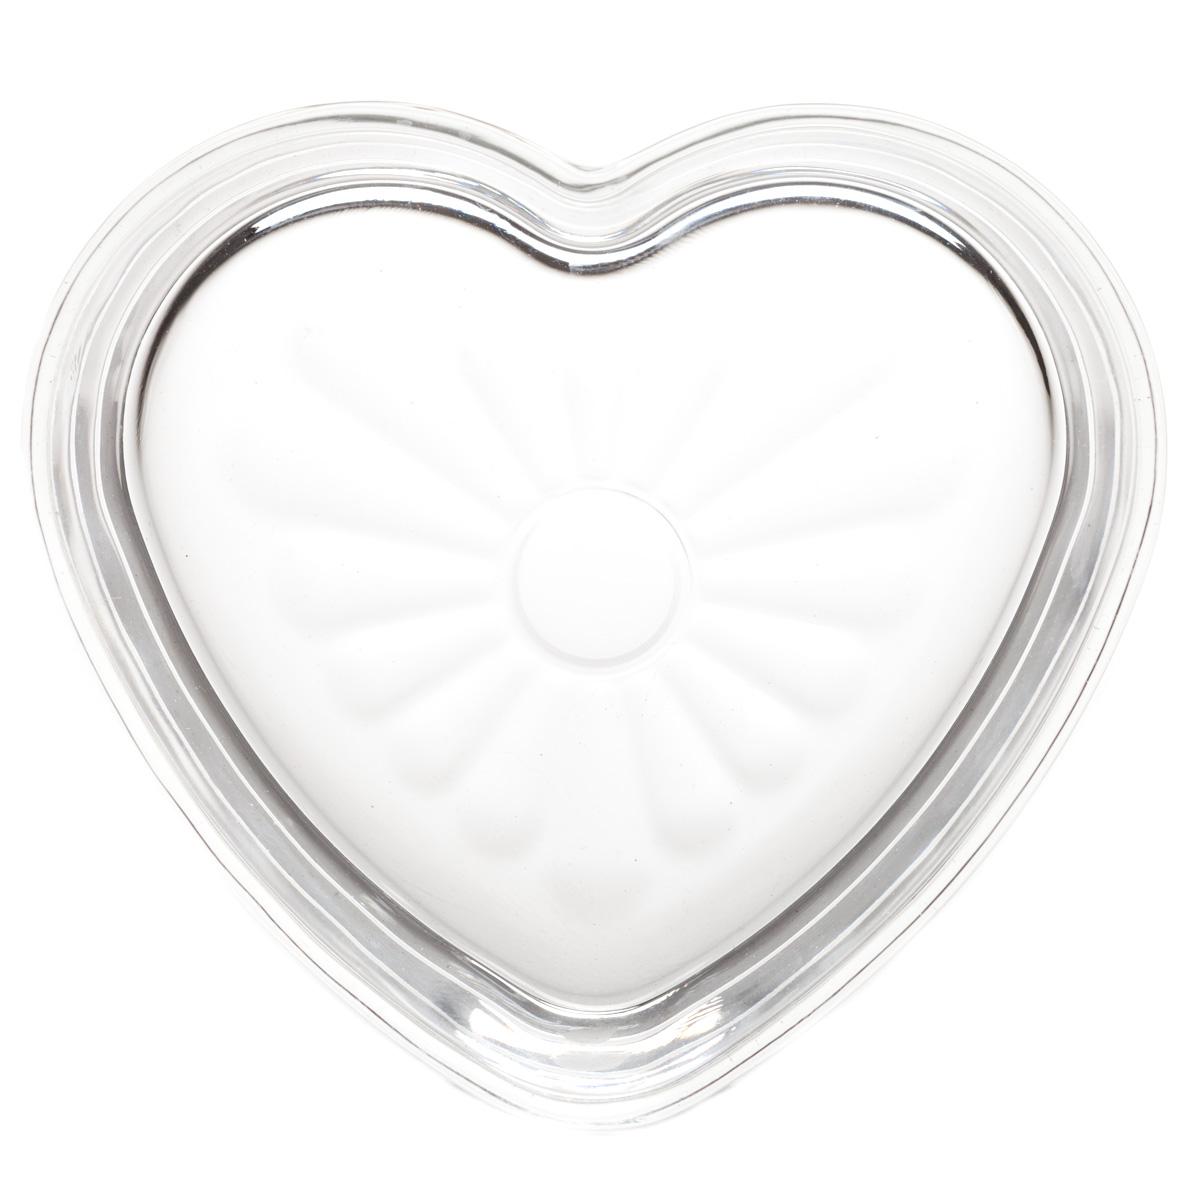 Heart shaped glass dildo